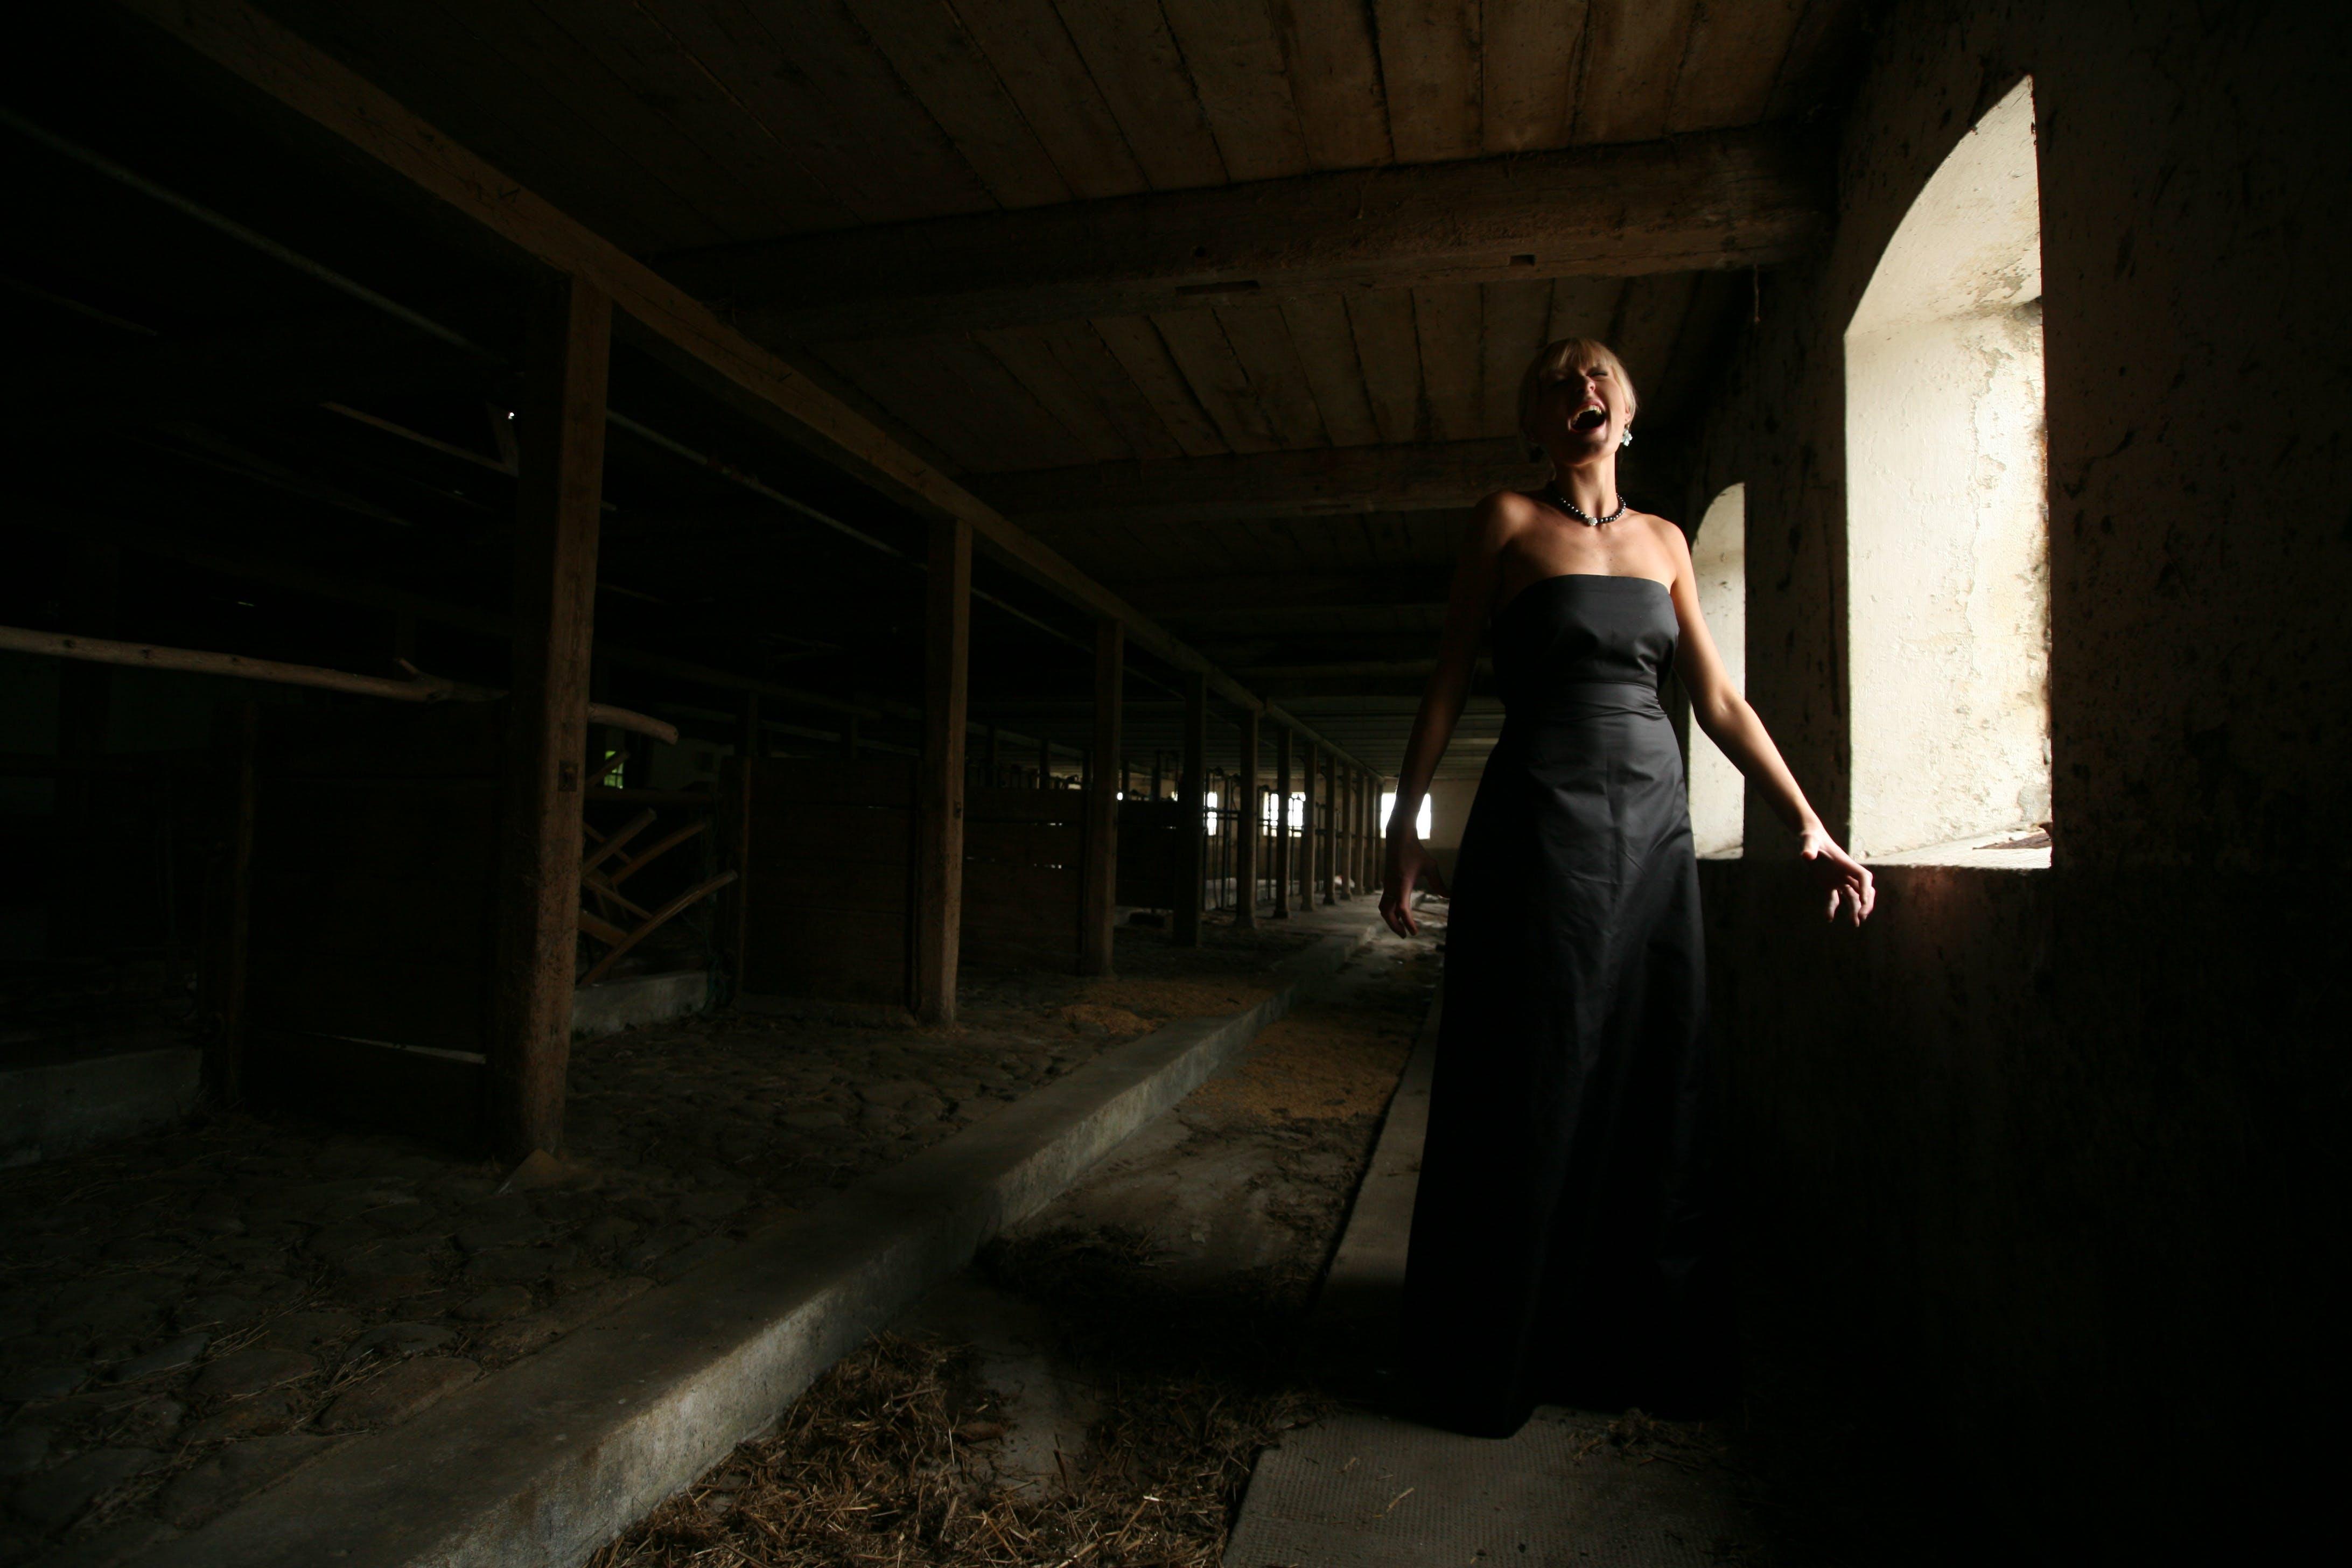 Woman Wearing Black Strapless Dress Standing Near the Window